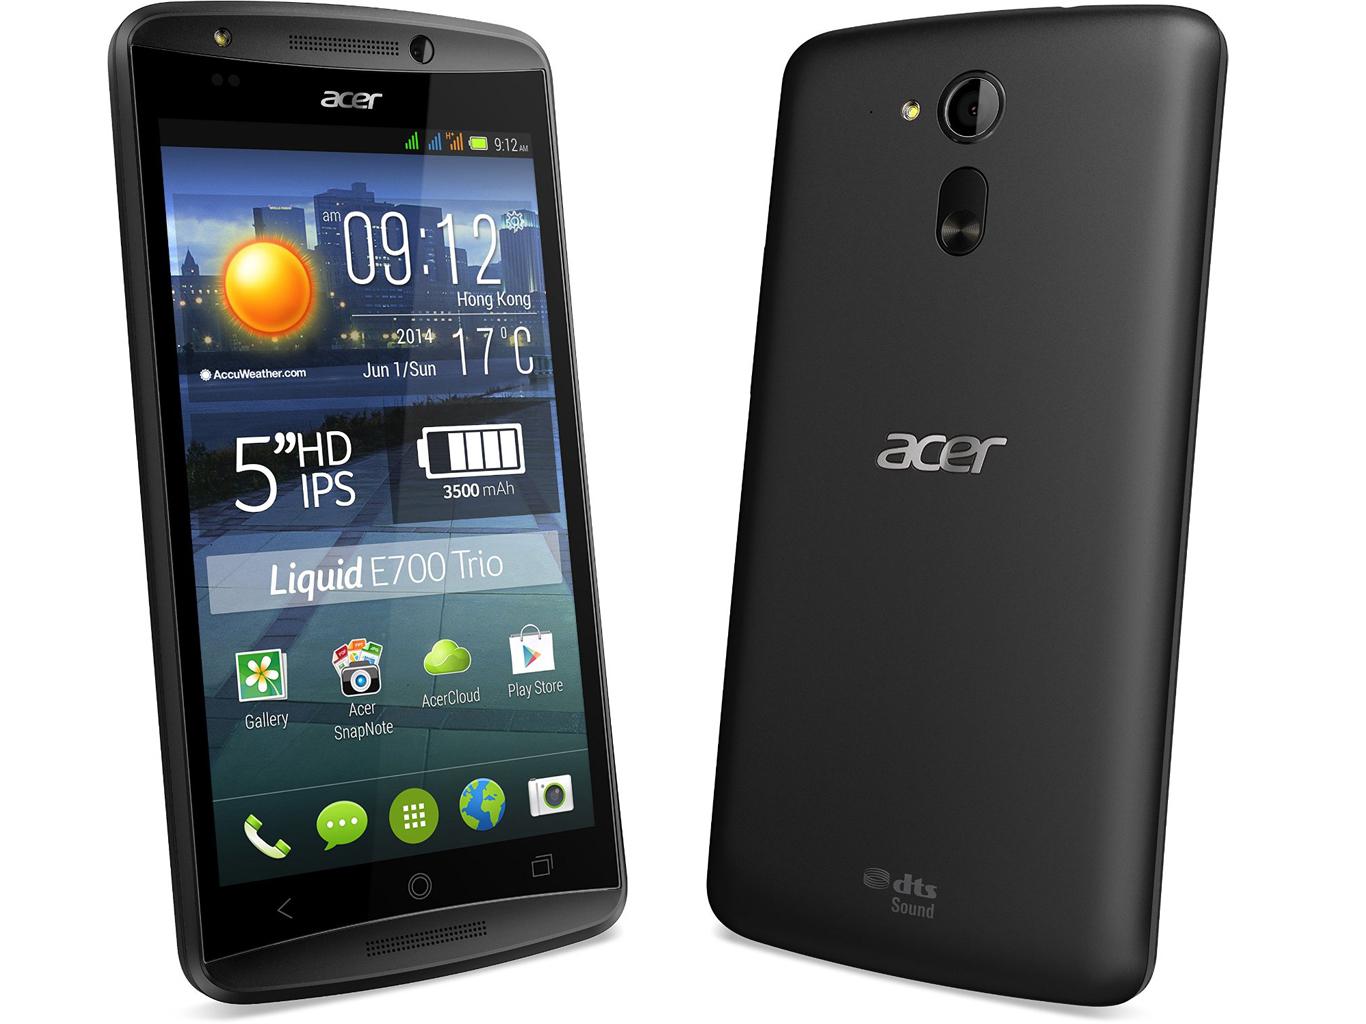 Breve Análisis Del Smartphone Acer Liquid E700 Trio